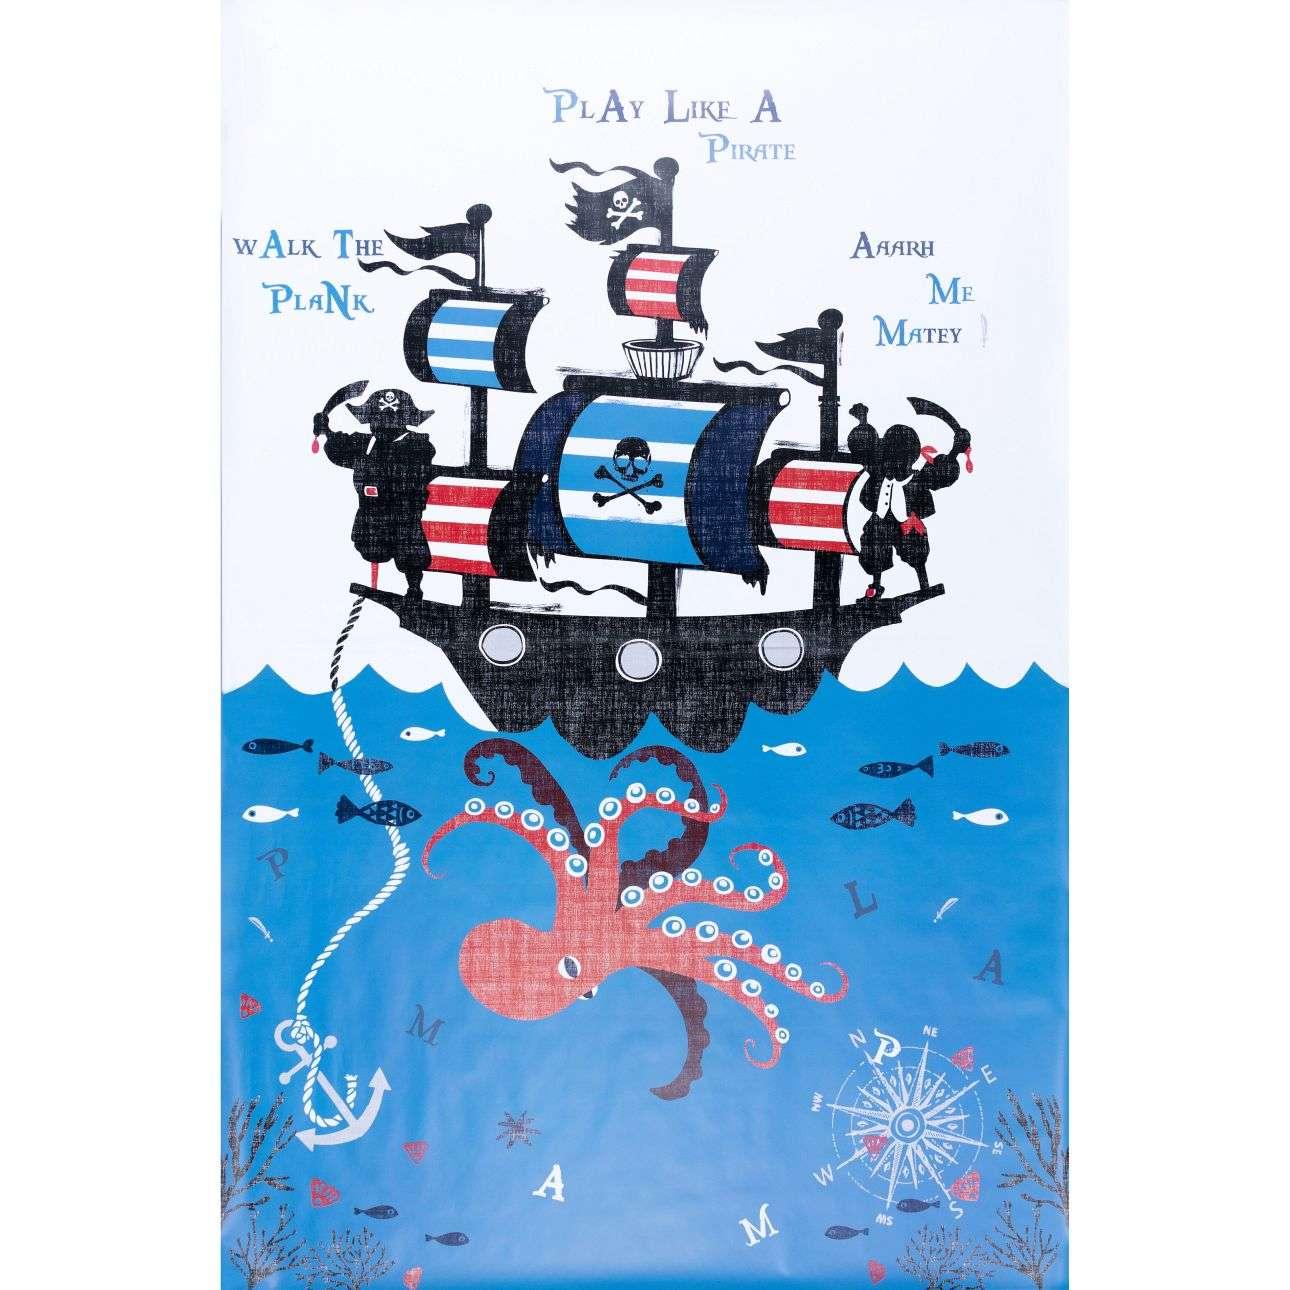 Tapeta Pirates 158x232cm